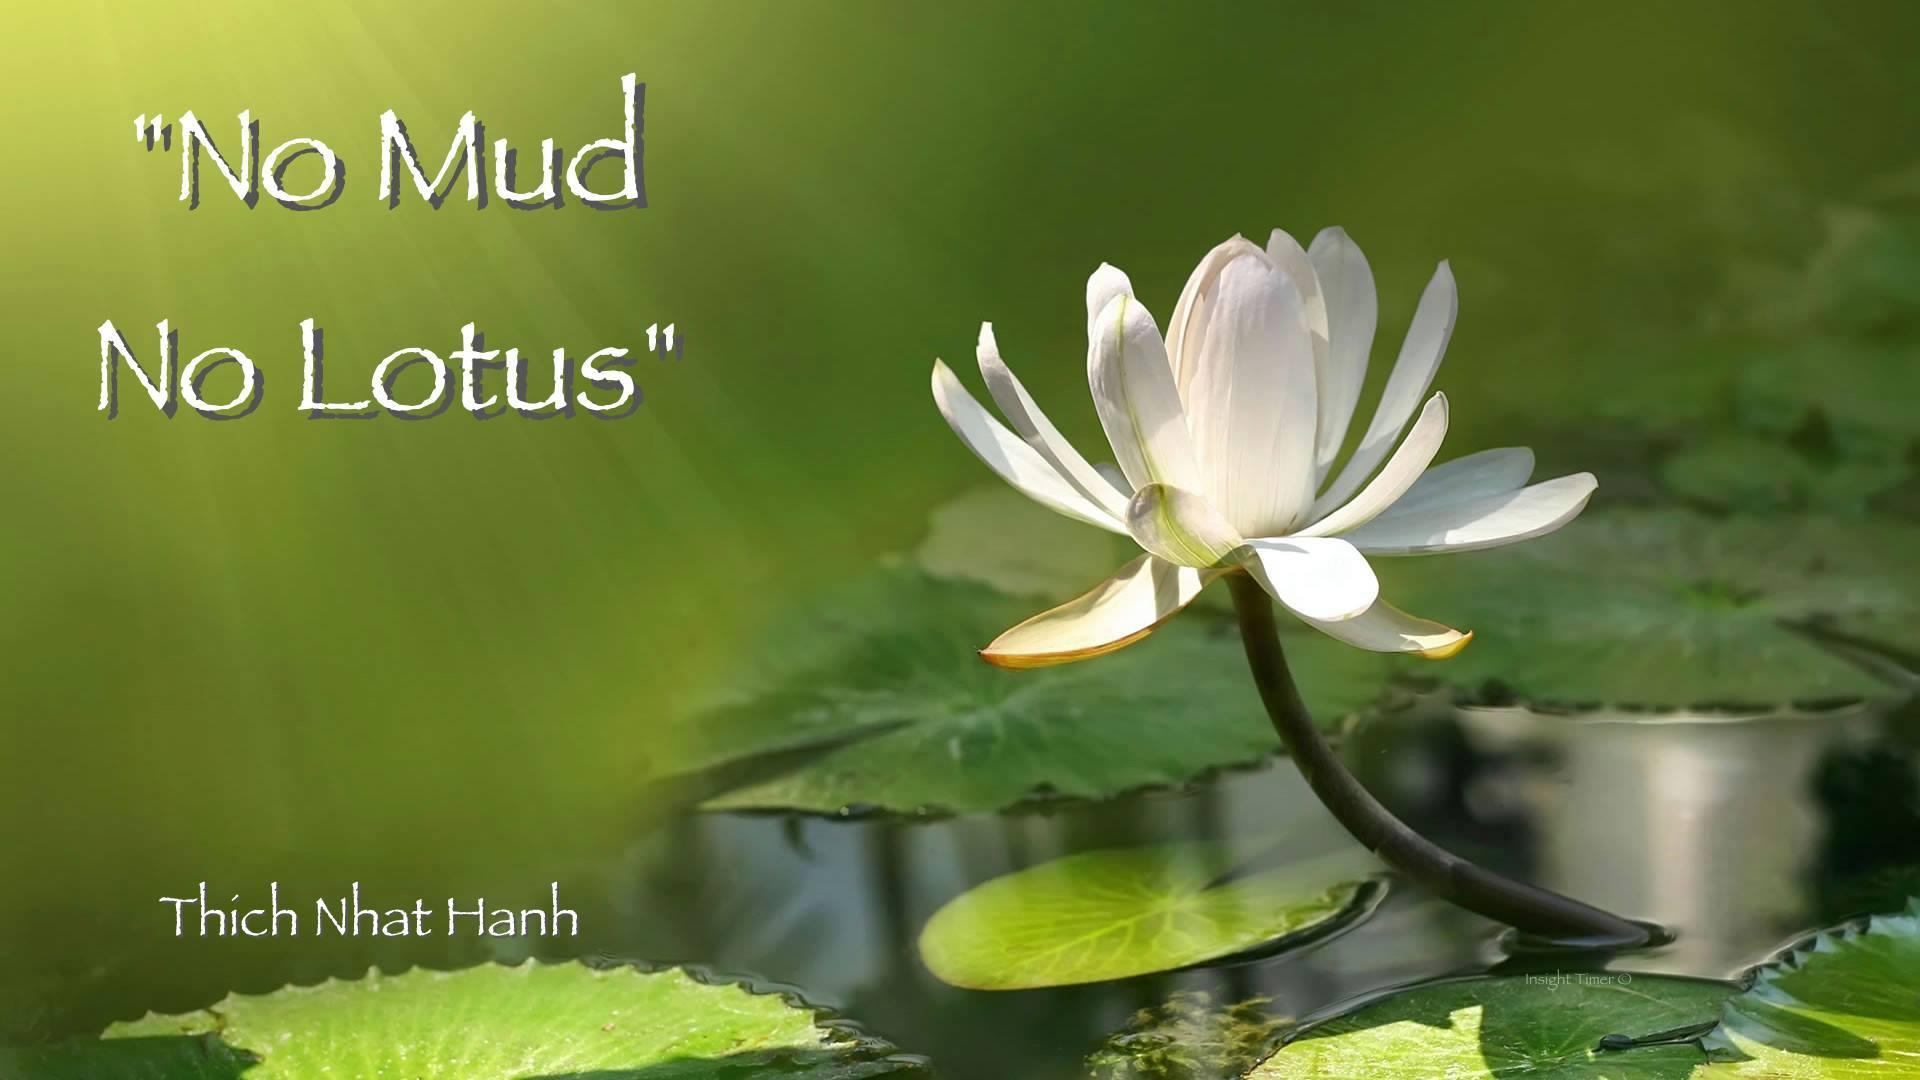 no-mud-no-lotus.jpg